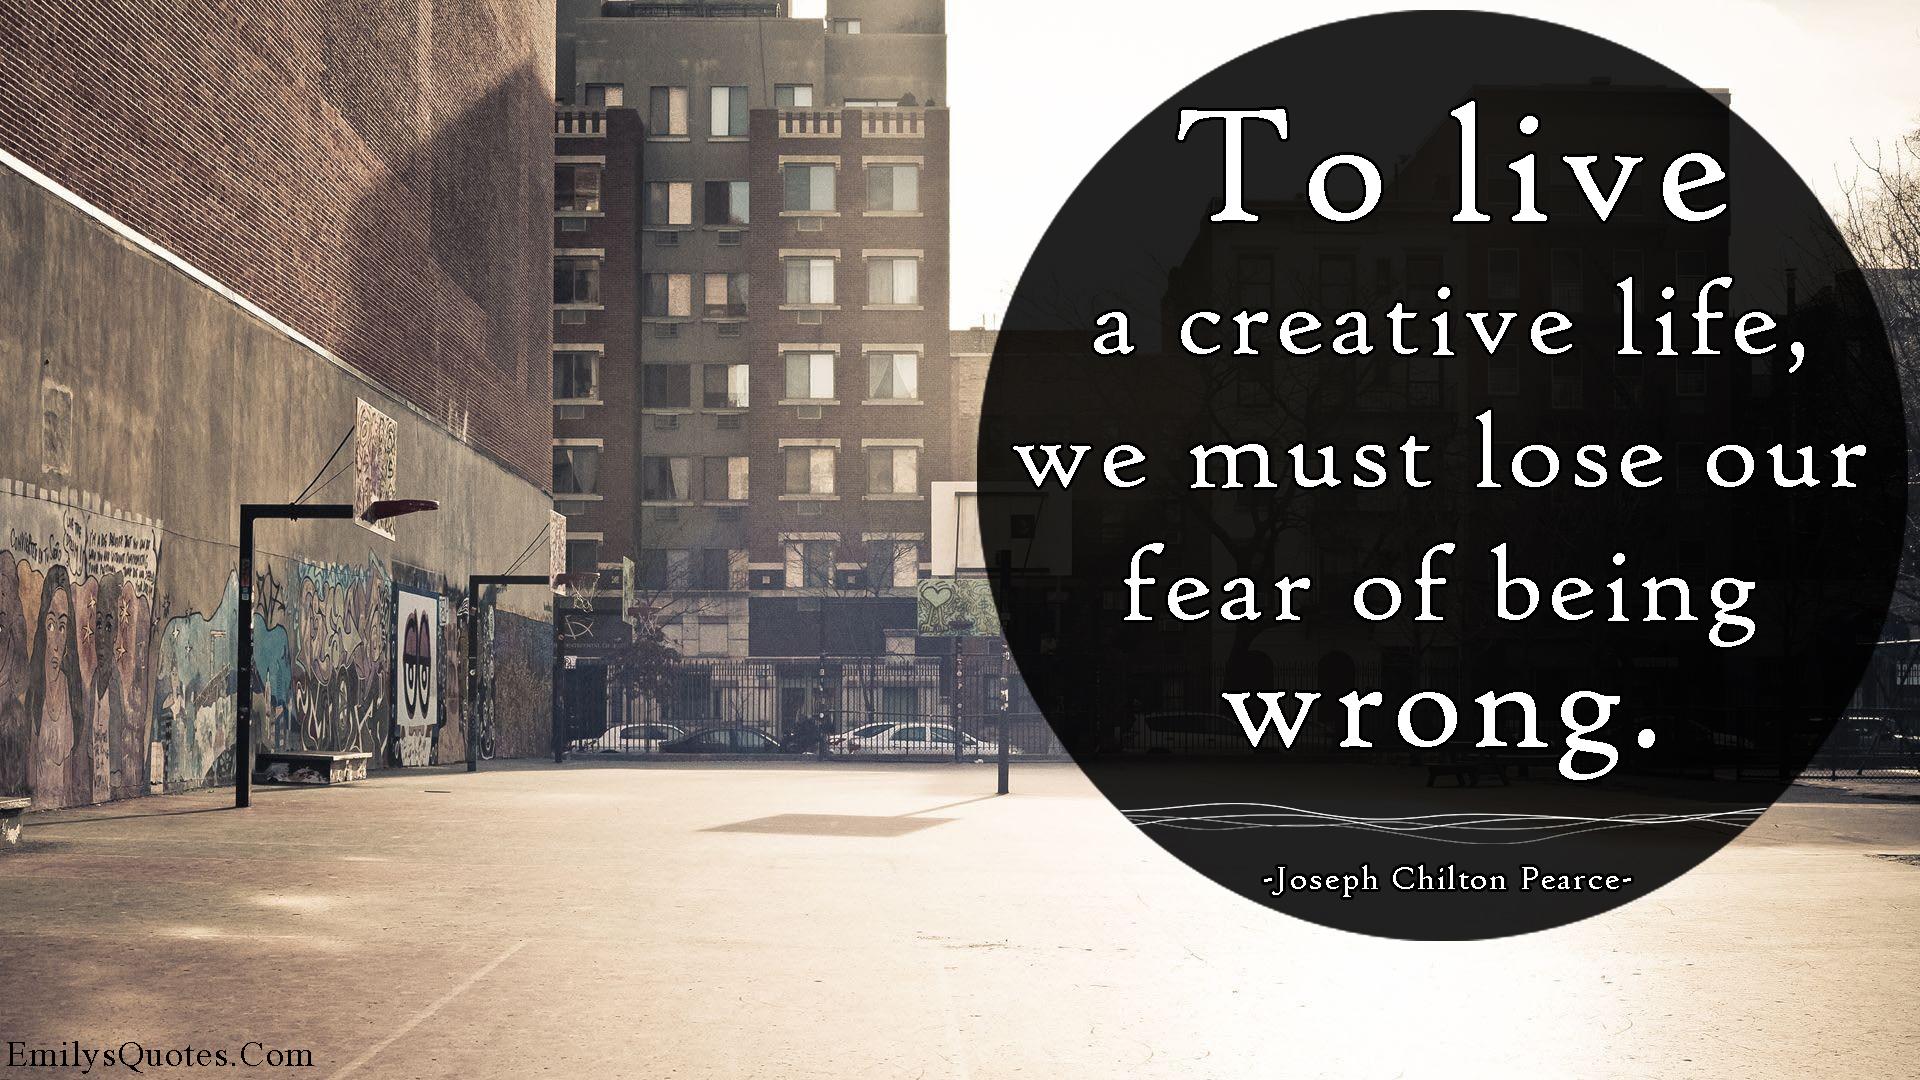 EmilysQuotes.Com - creative, life, lose, fear, wrong, choice, encouraging, Joseph Chilton Pearce